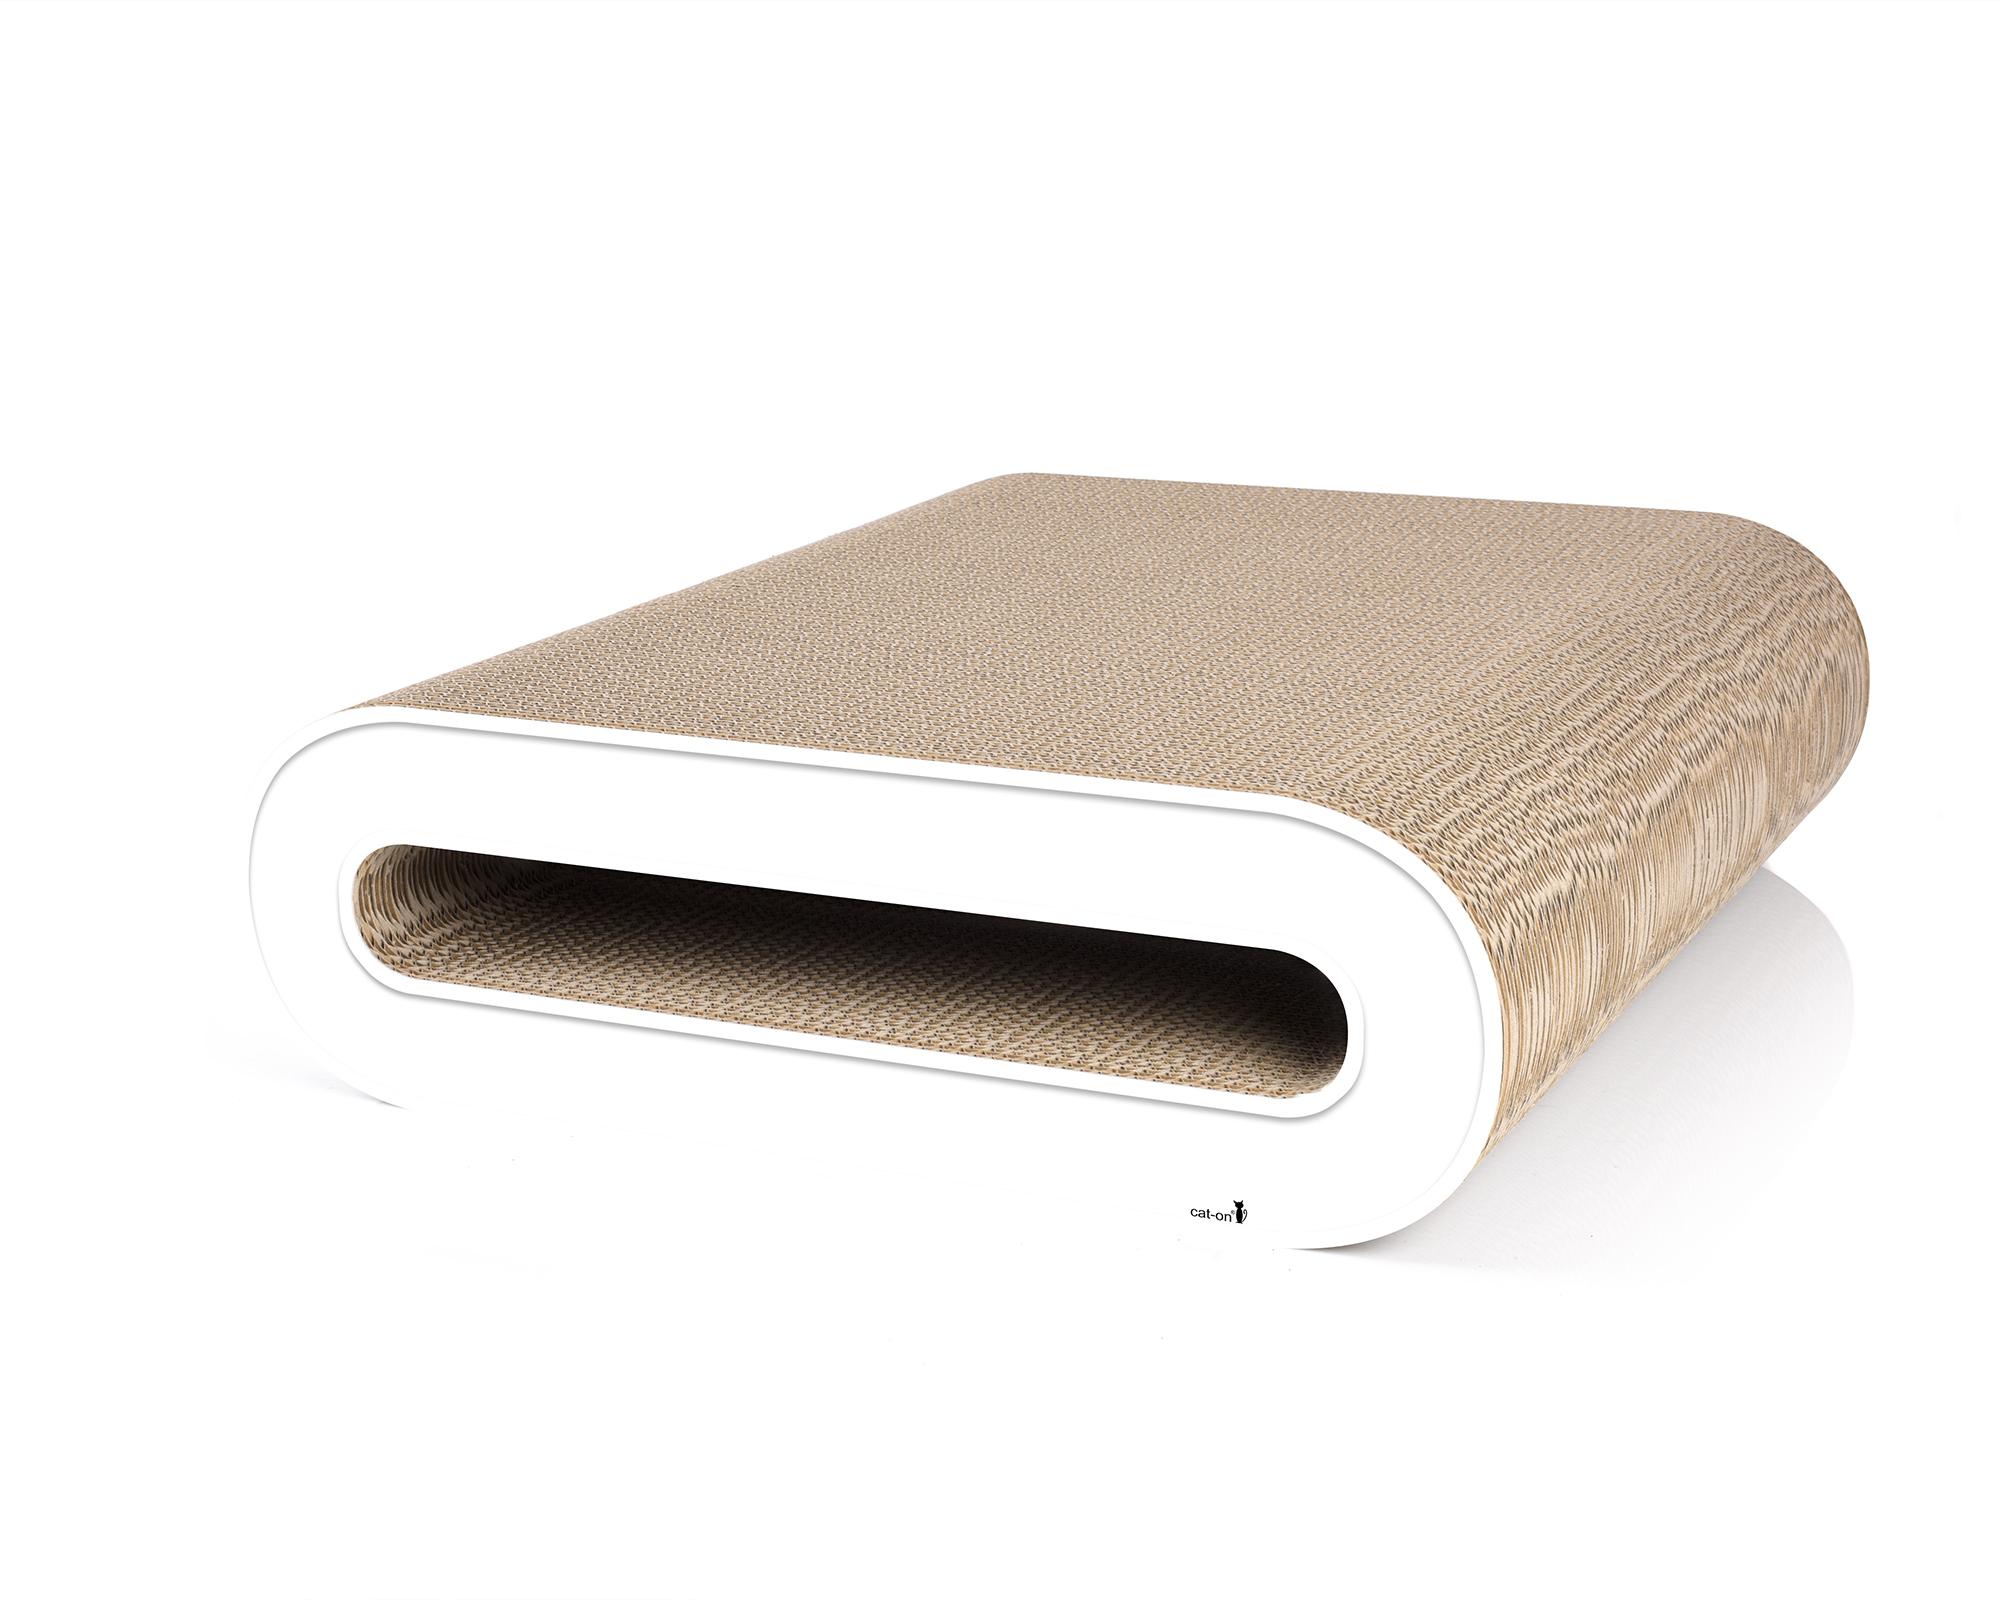 Kratzmöbel Le Rouleau 000 weiß